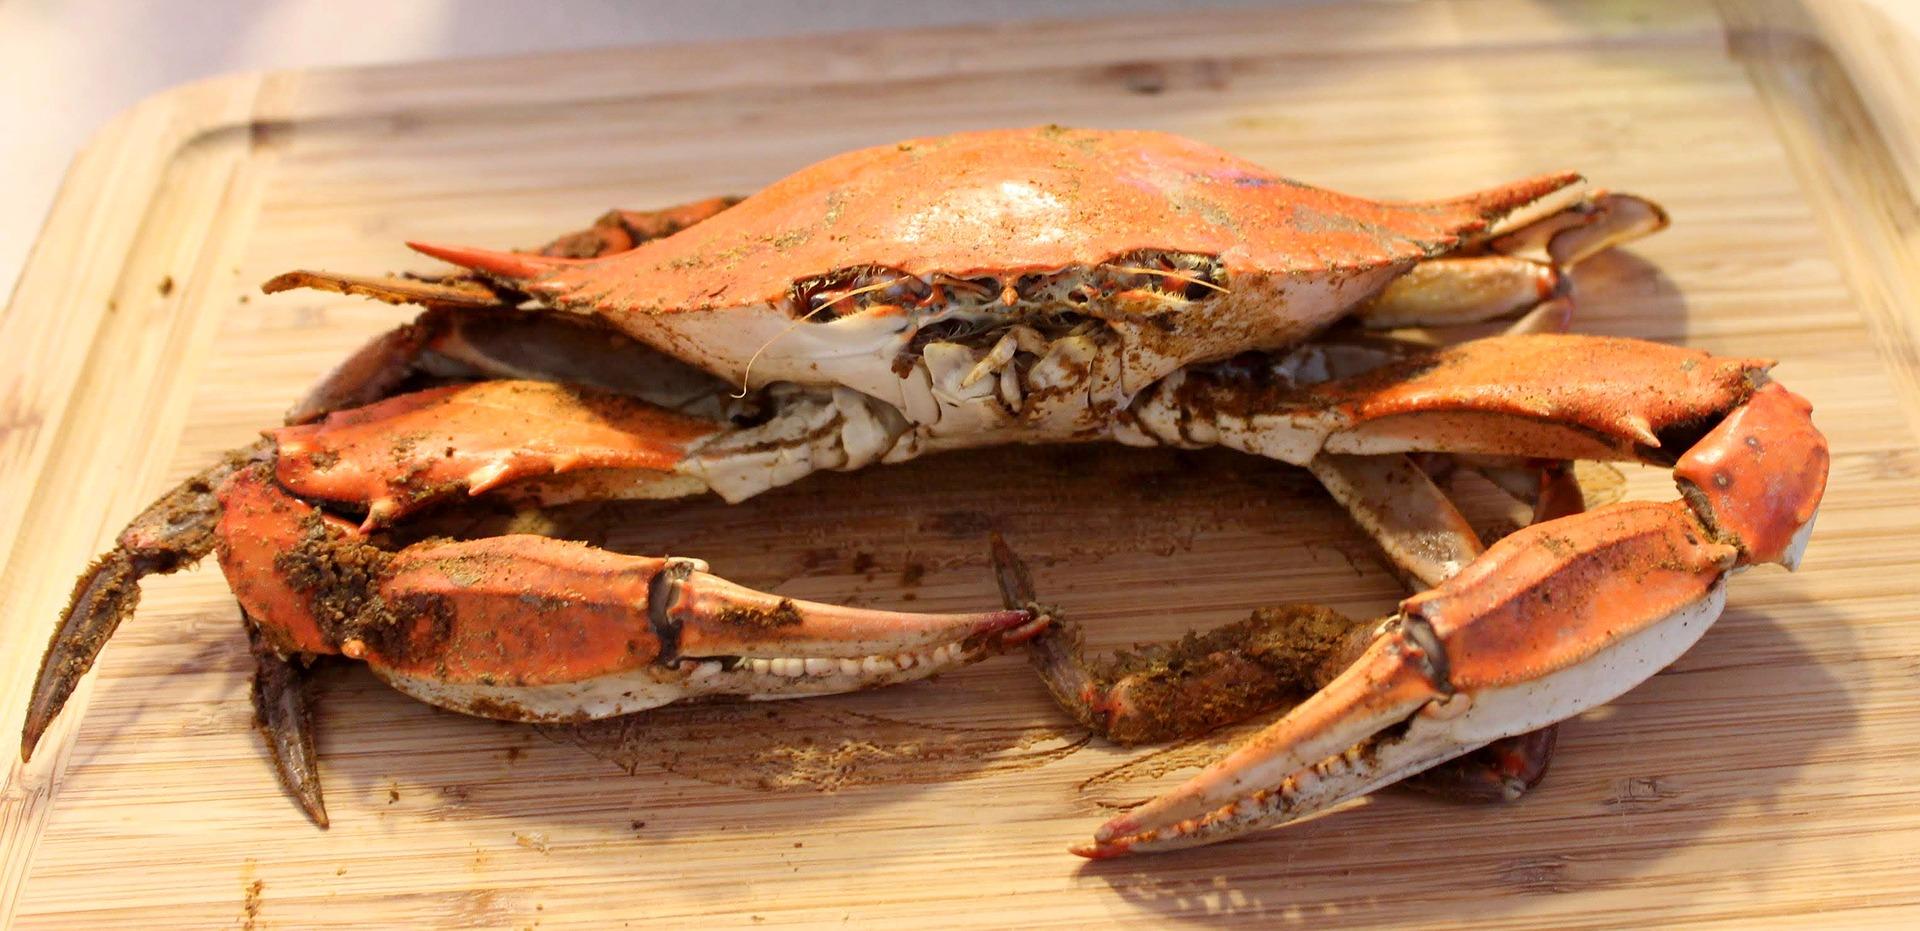 Steamed crab on cutting board.